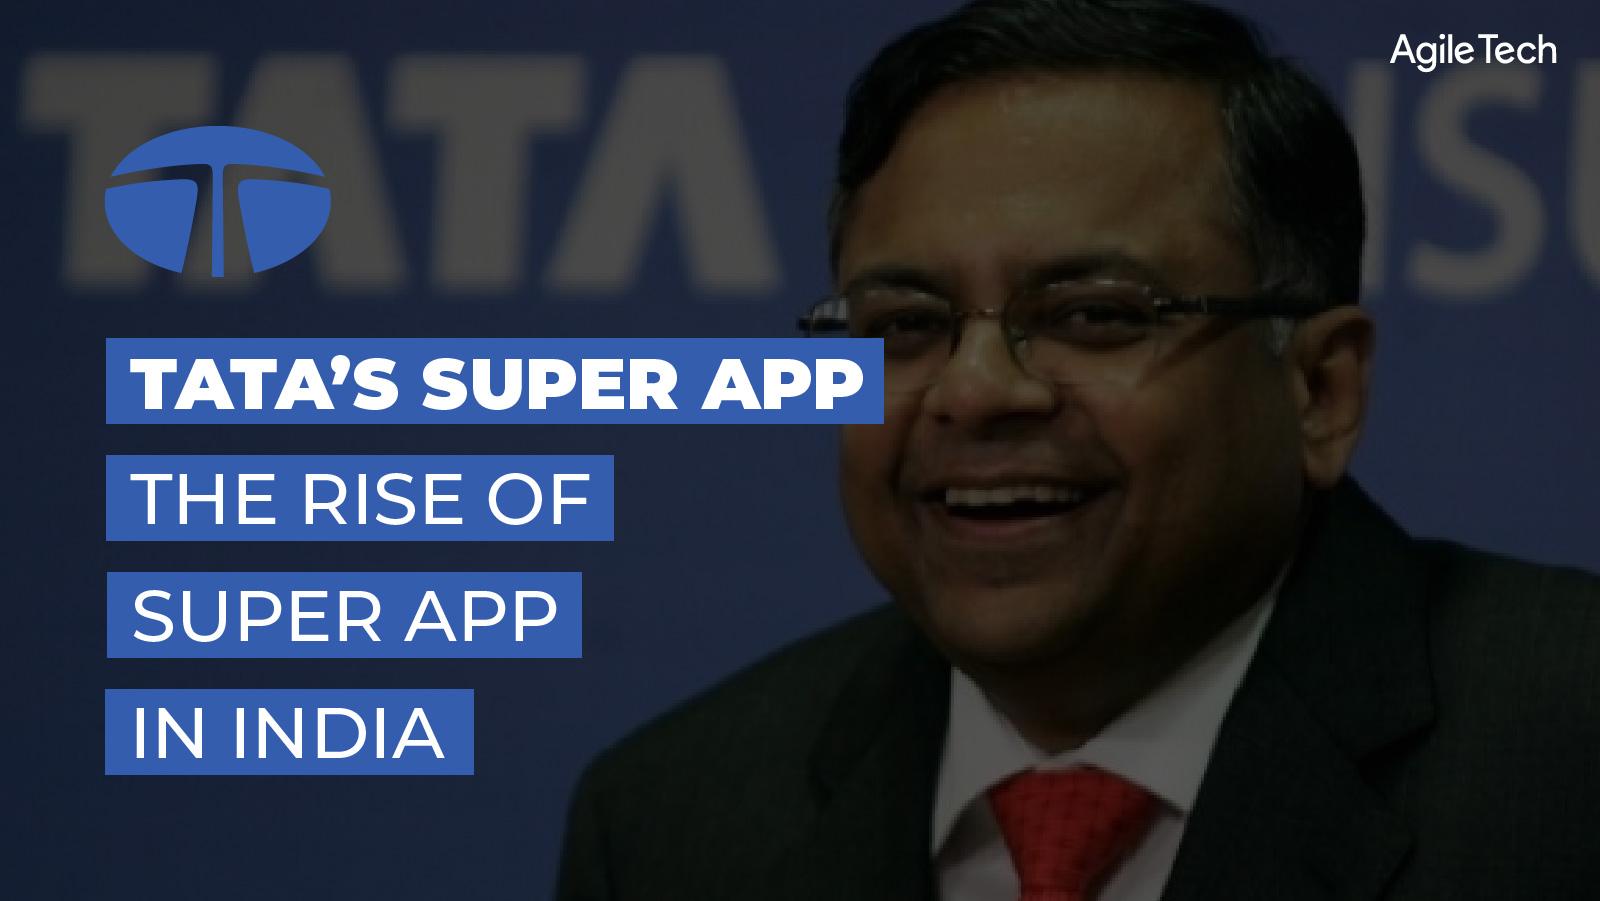 tata super app, tata group plan to launch super app, the rise of super app in India, agiletech